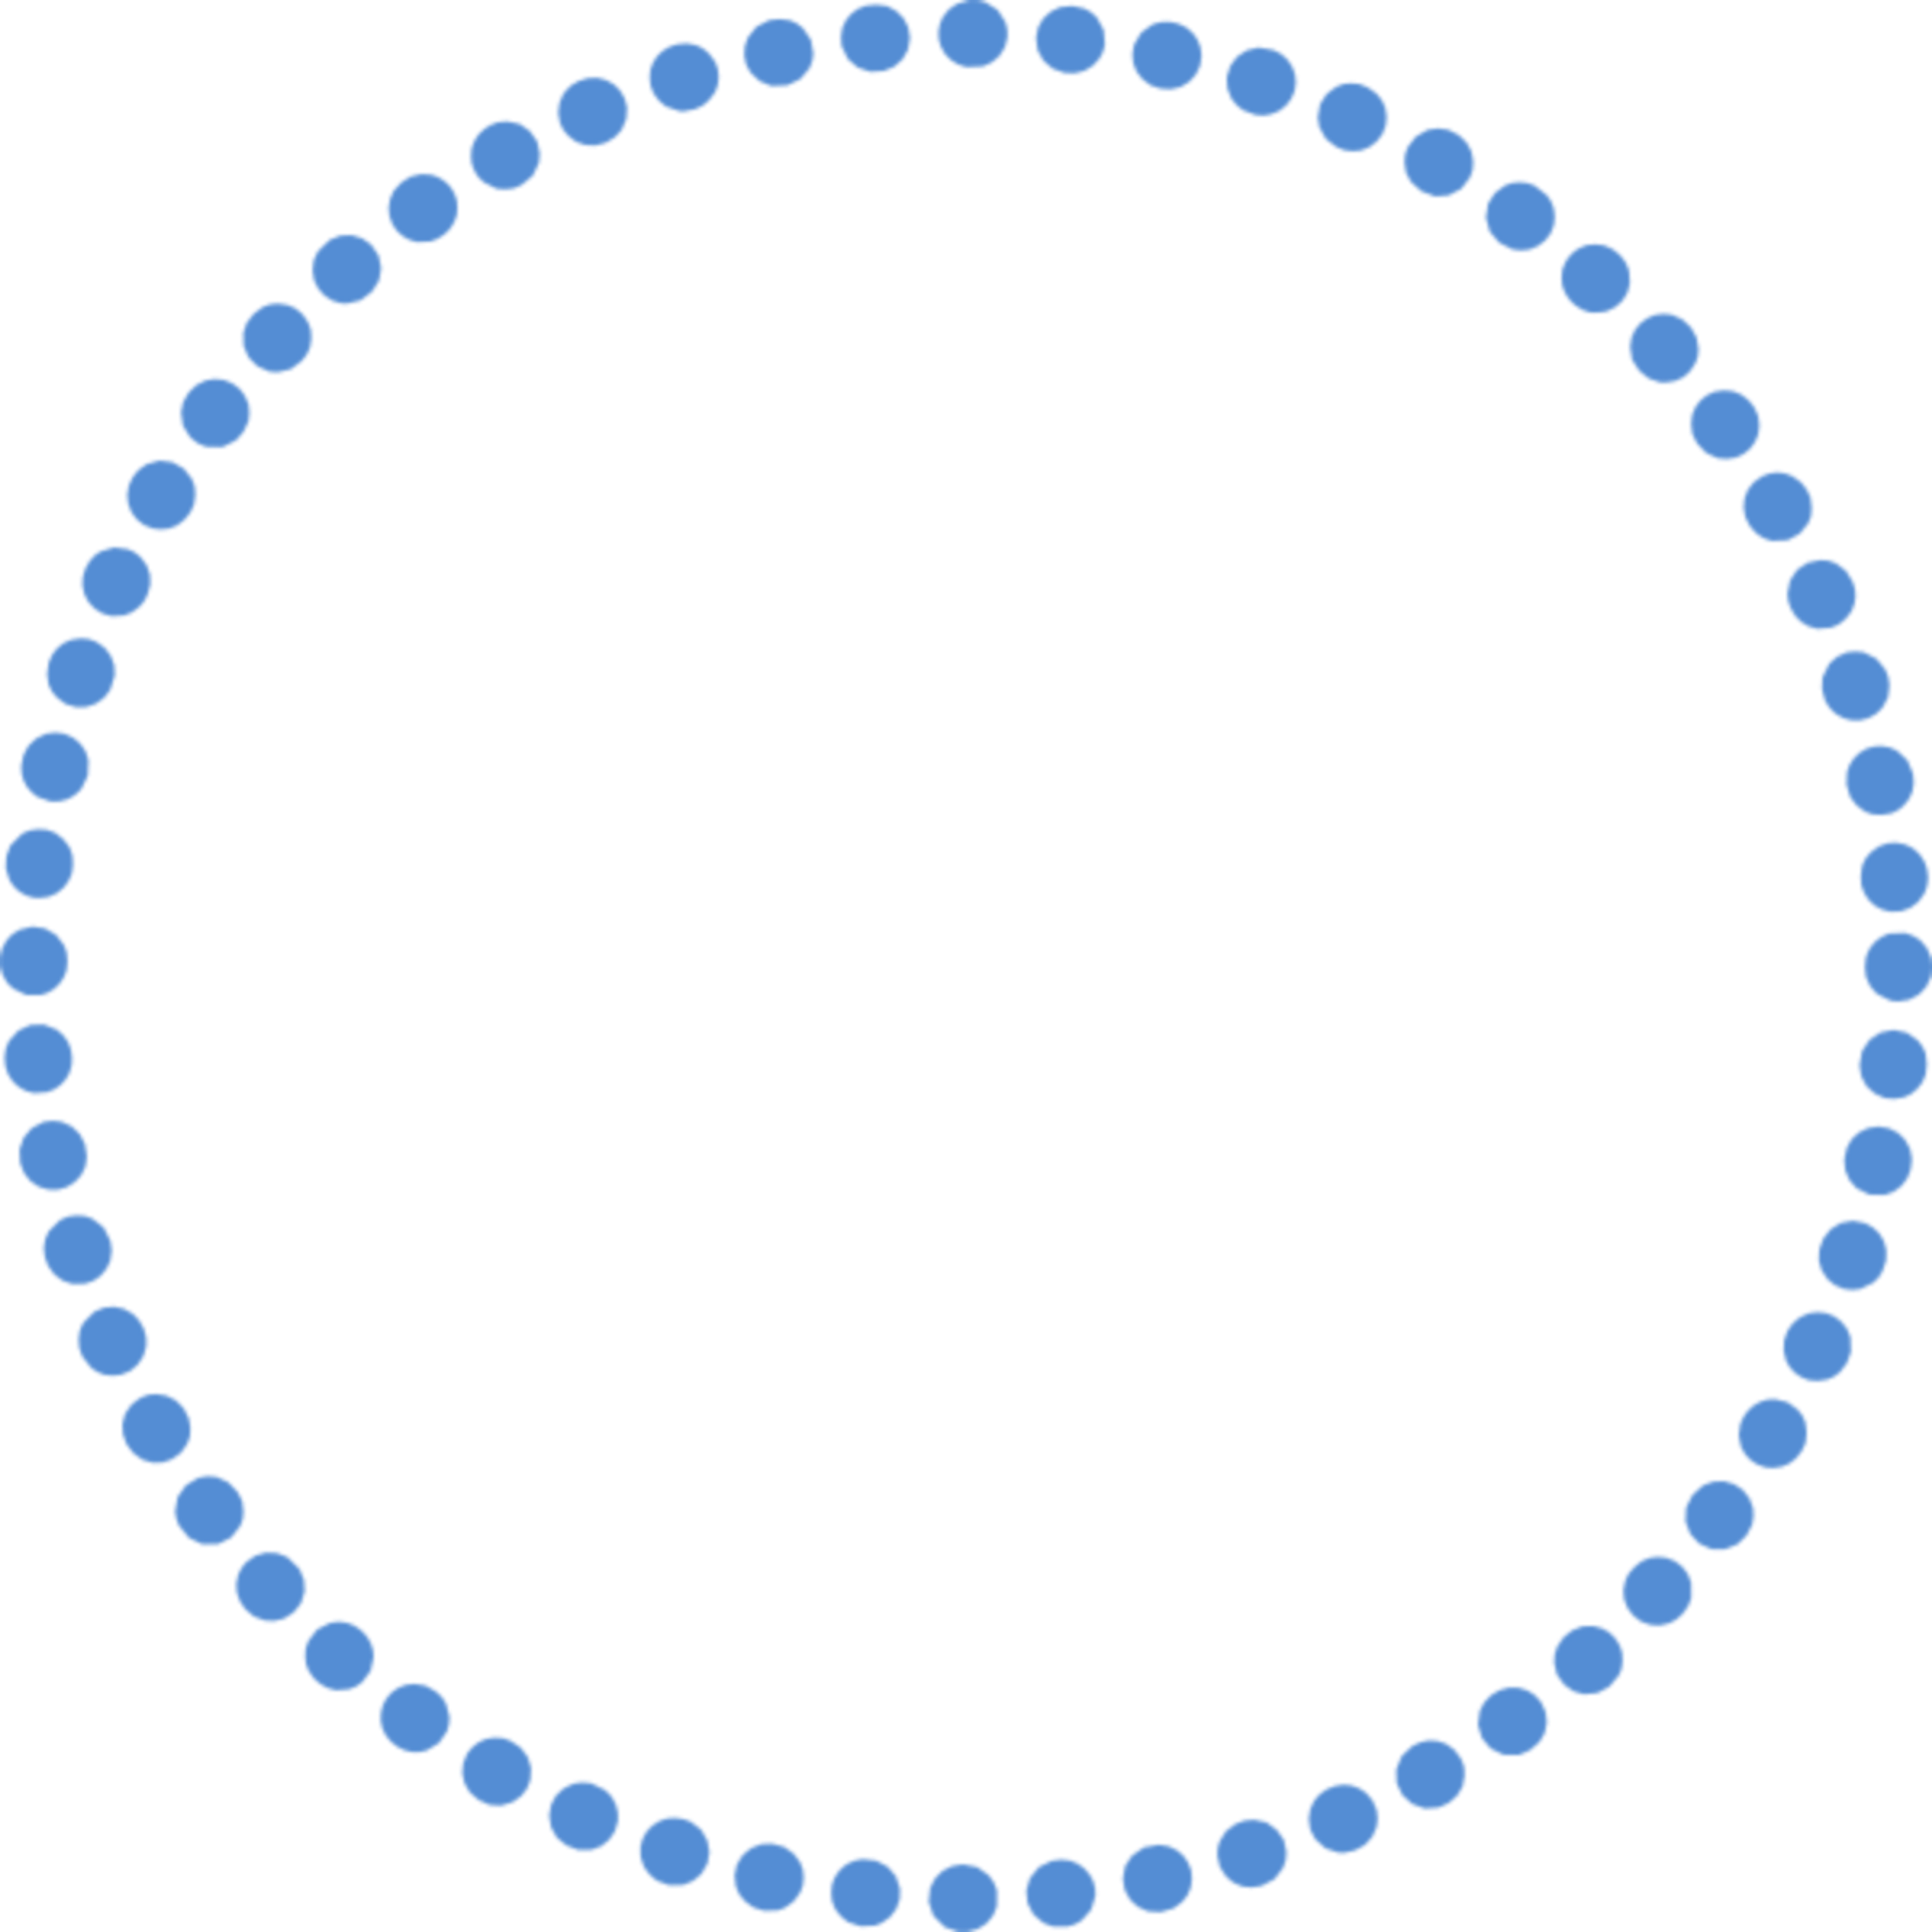 Картинка круг по точкам